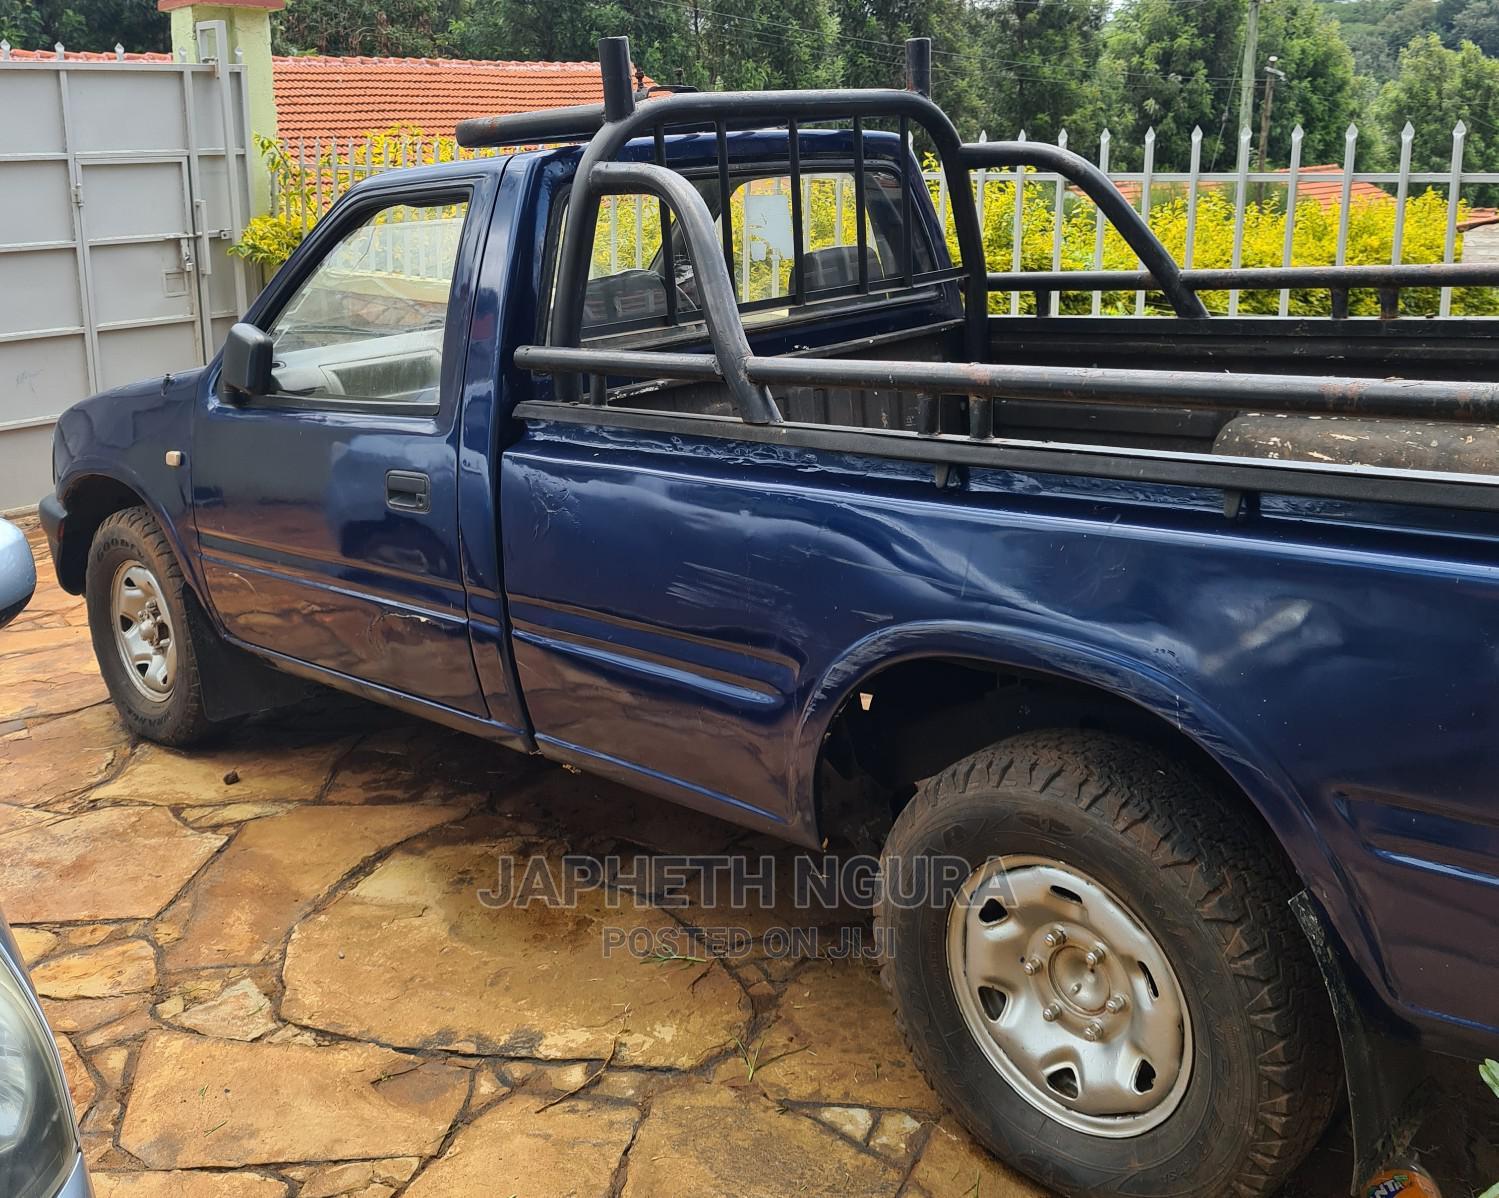 Archive: Isuzu Tougher 2004 Blue in Ngong - Cars, Japheth